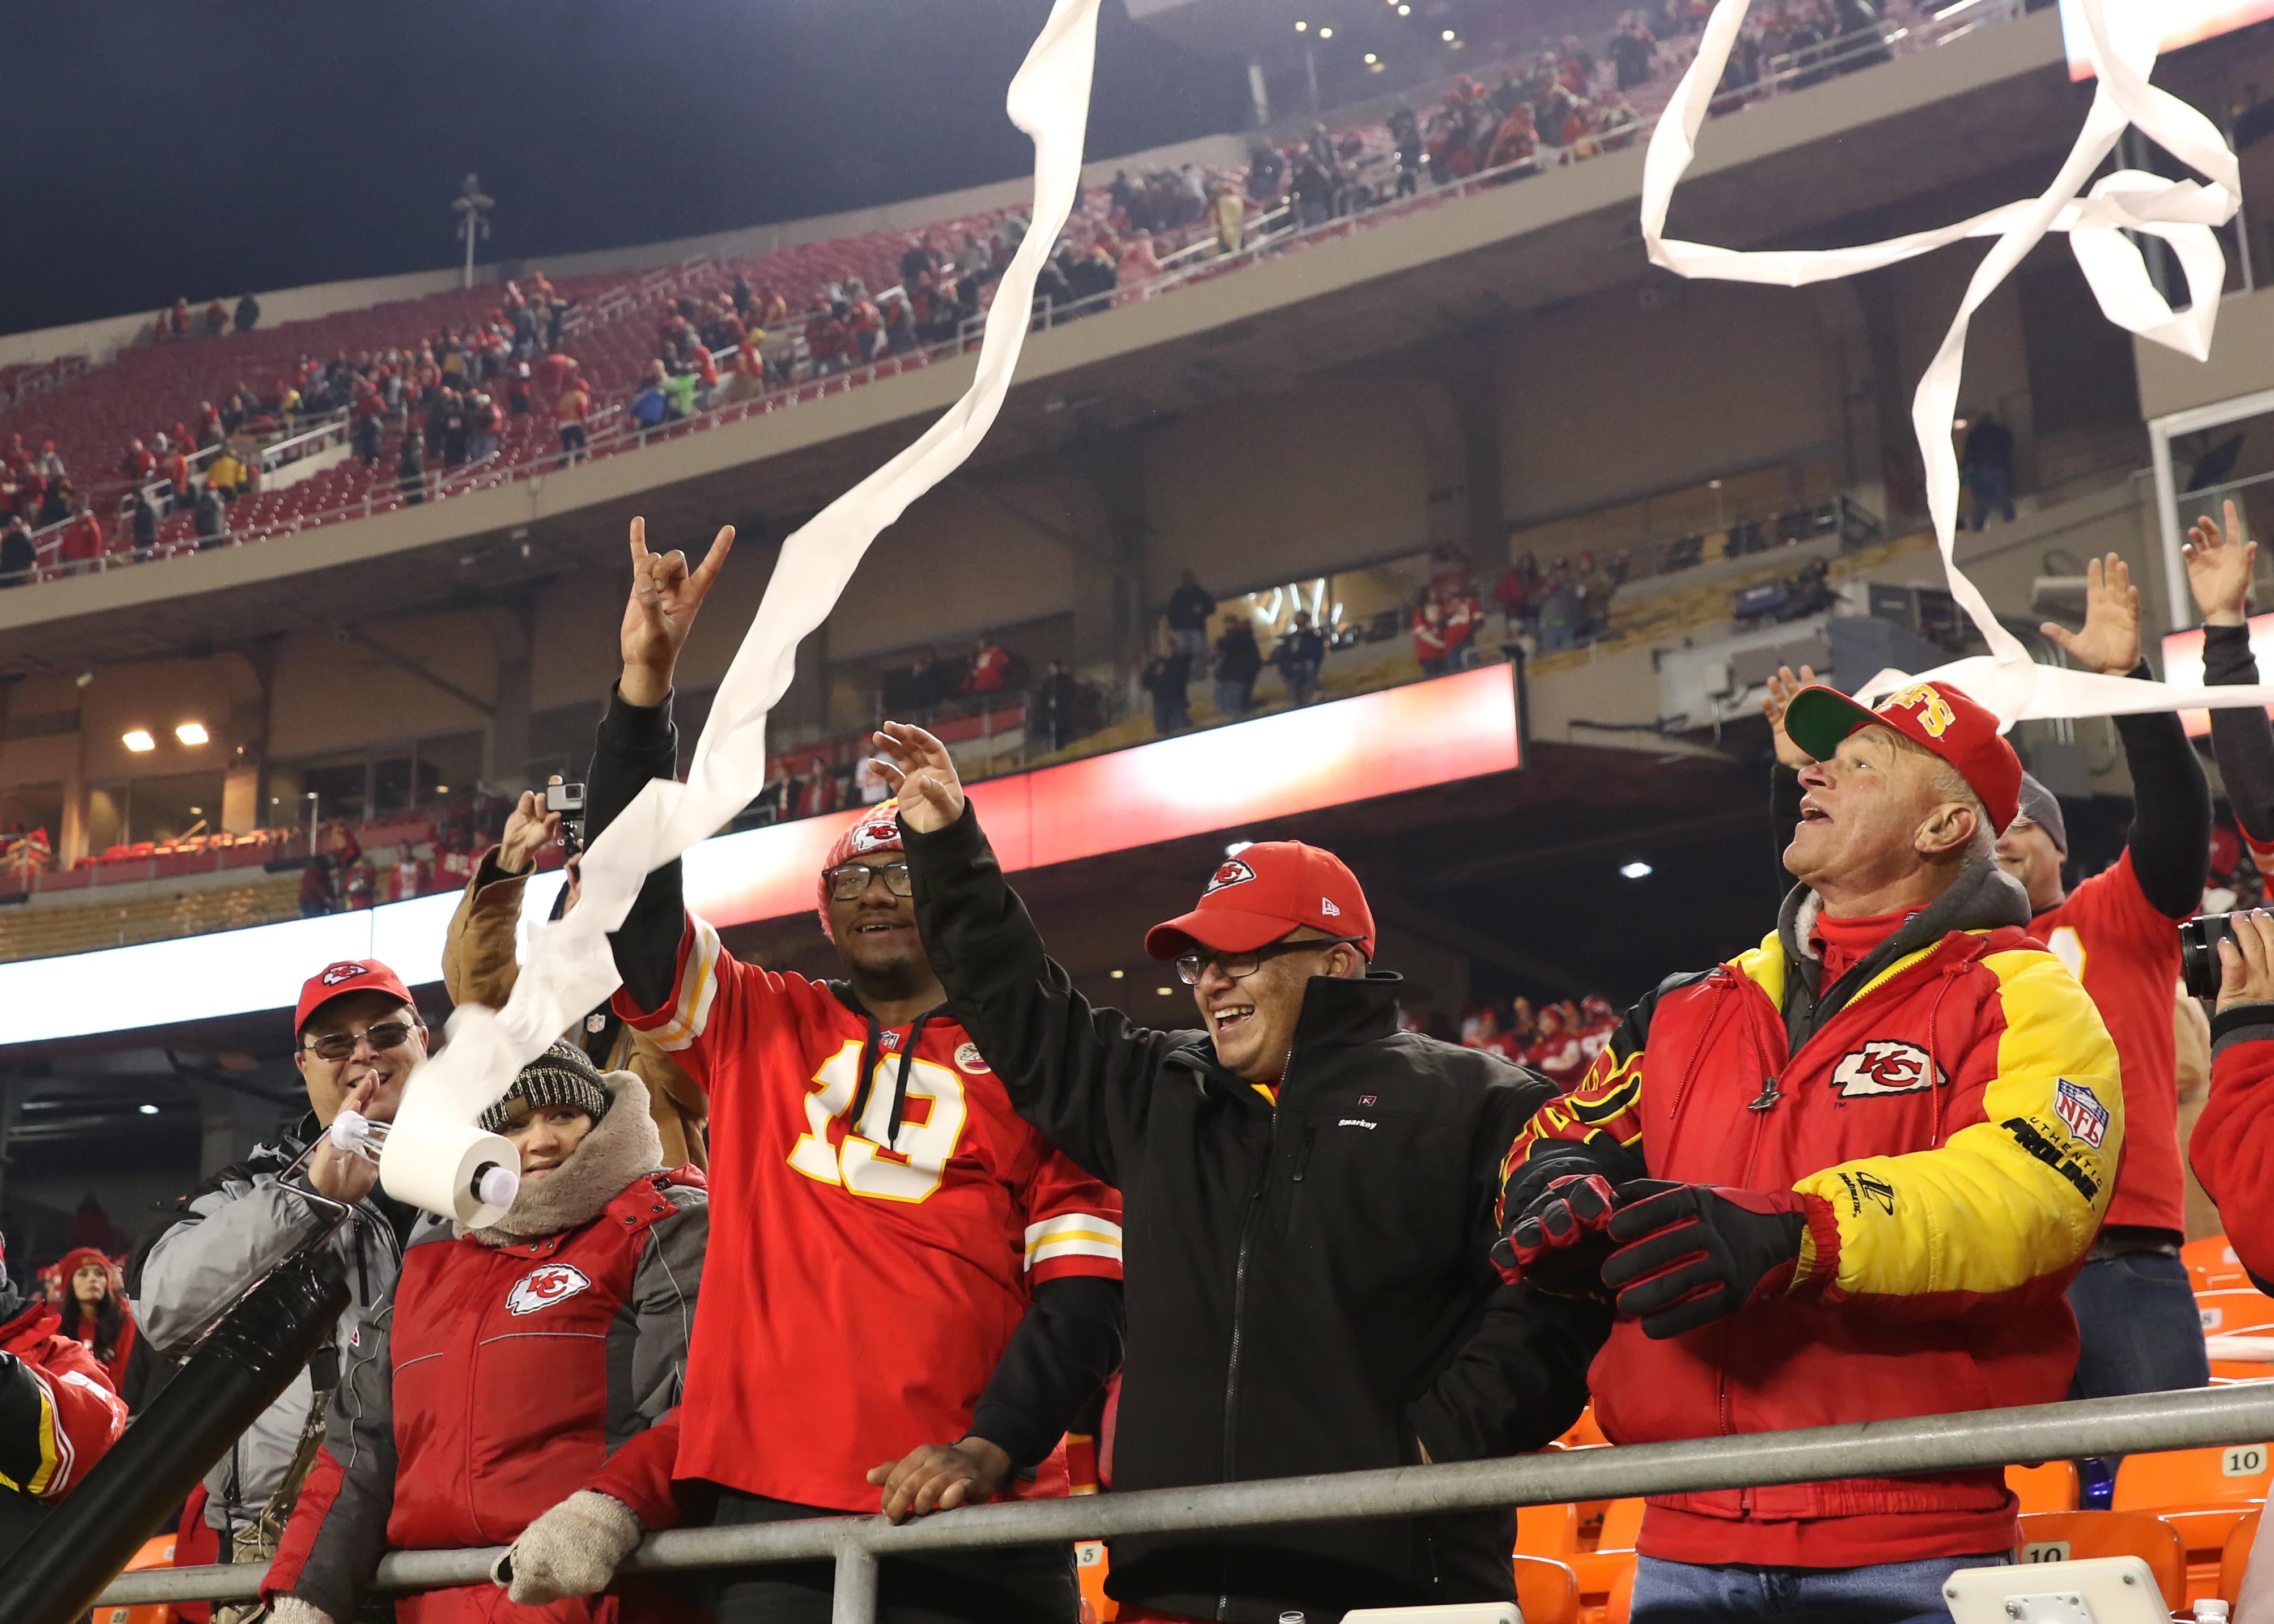 NFL: DEC 30 Raiders at Chiefs